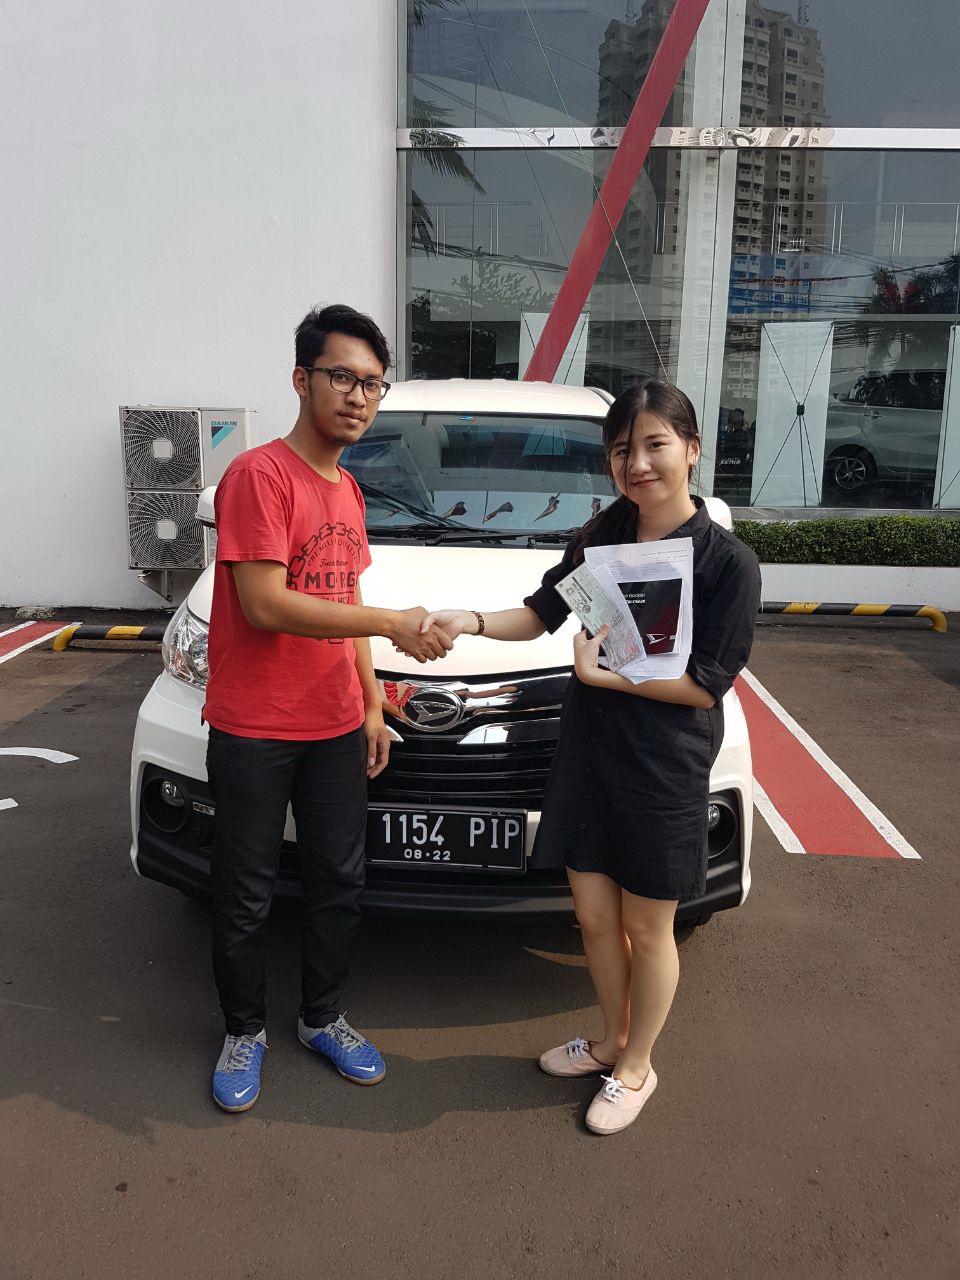 Riyana Daihatsu Jakarta Barat: Promo dan Harga Mobil ...